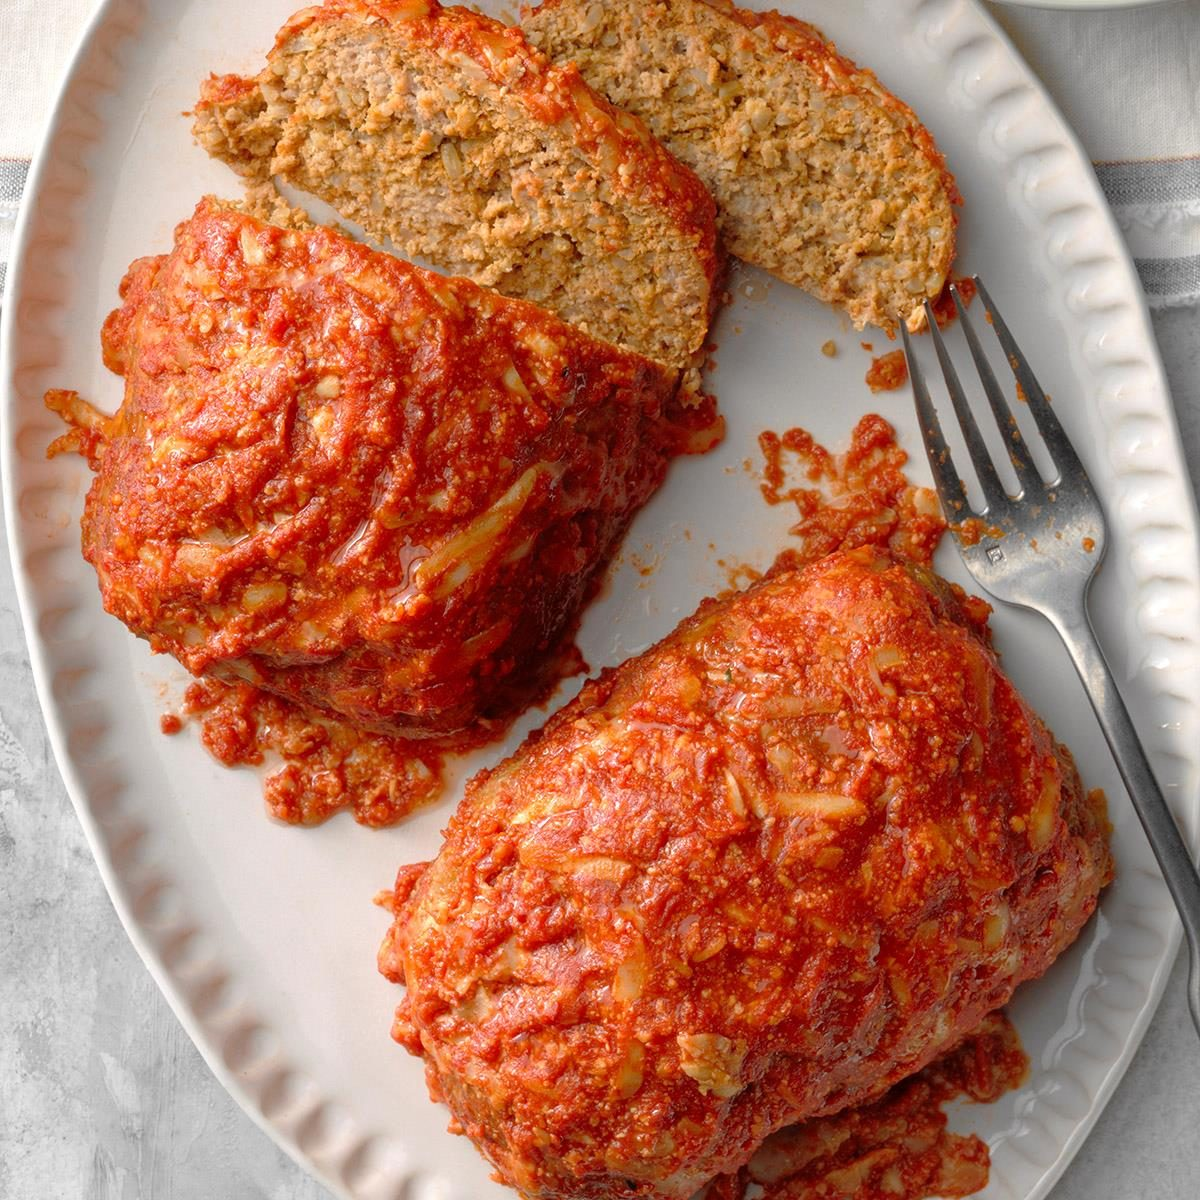 Day 3: Taco Turkey Meat Loaf